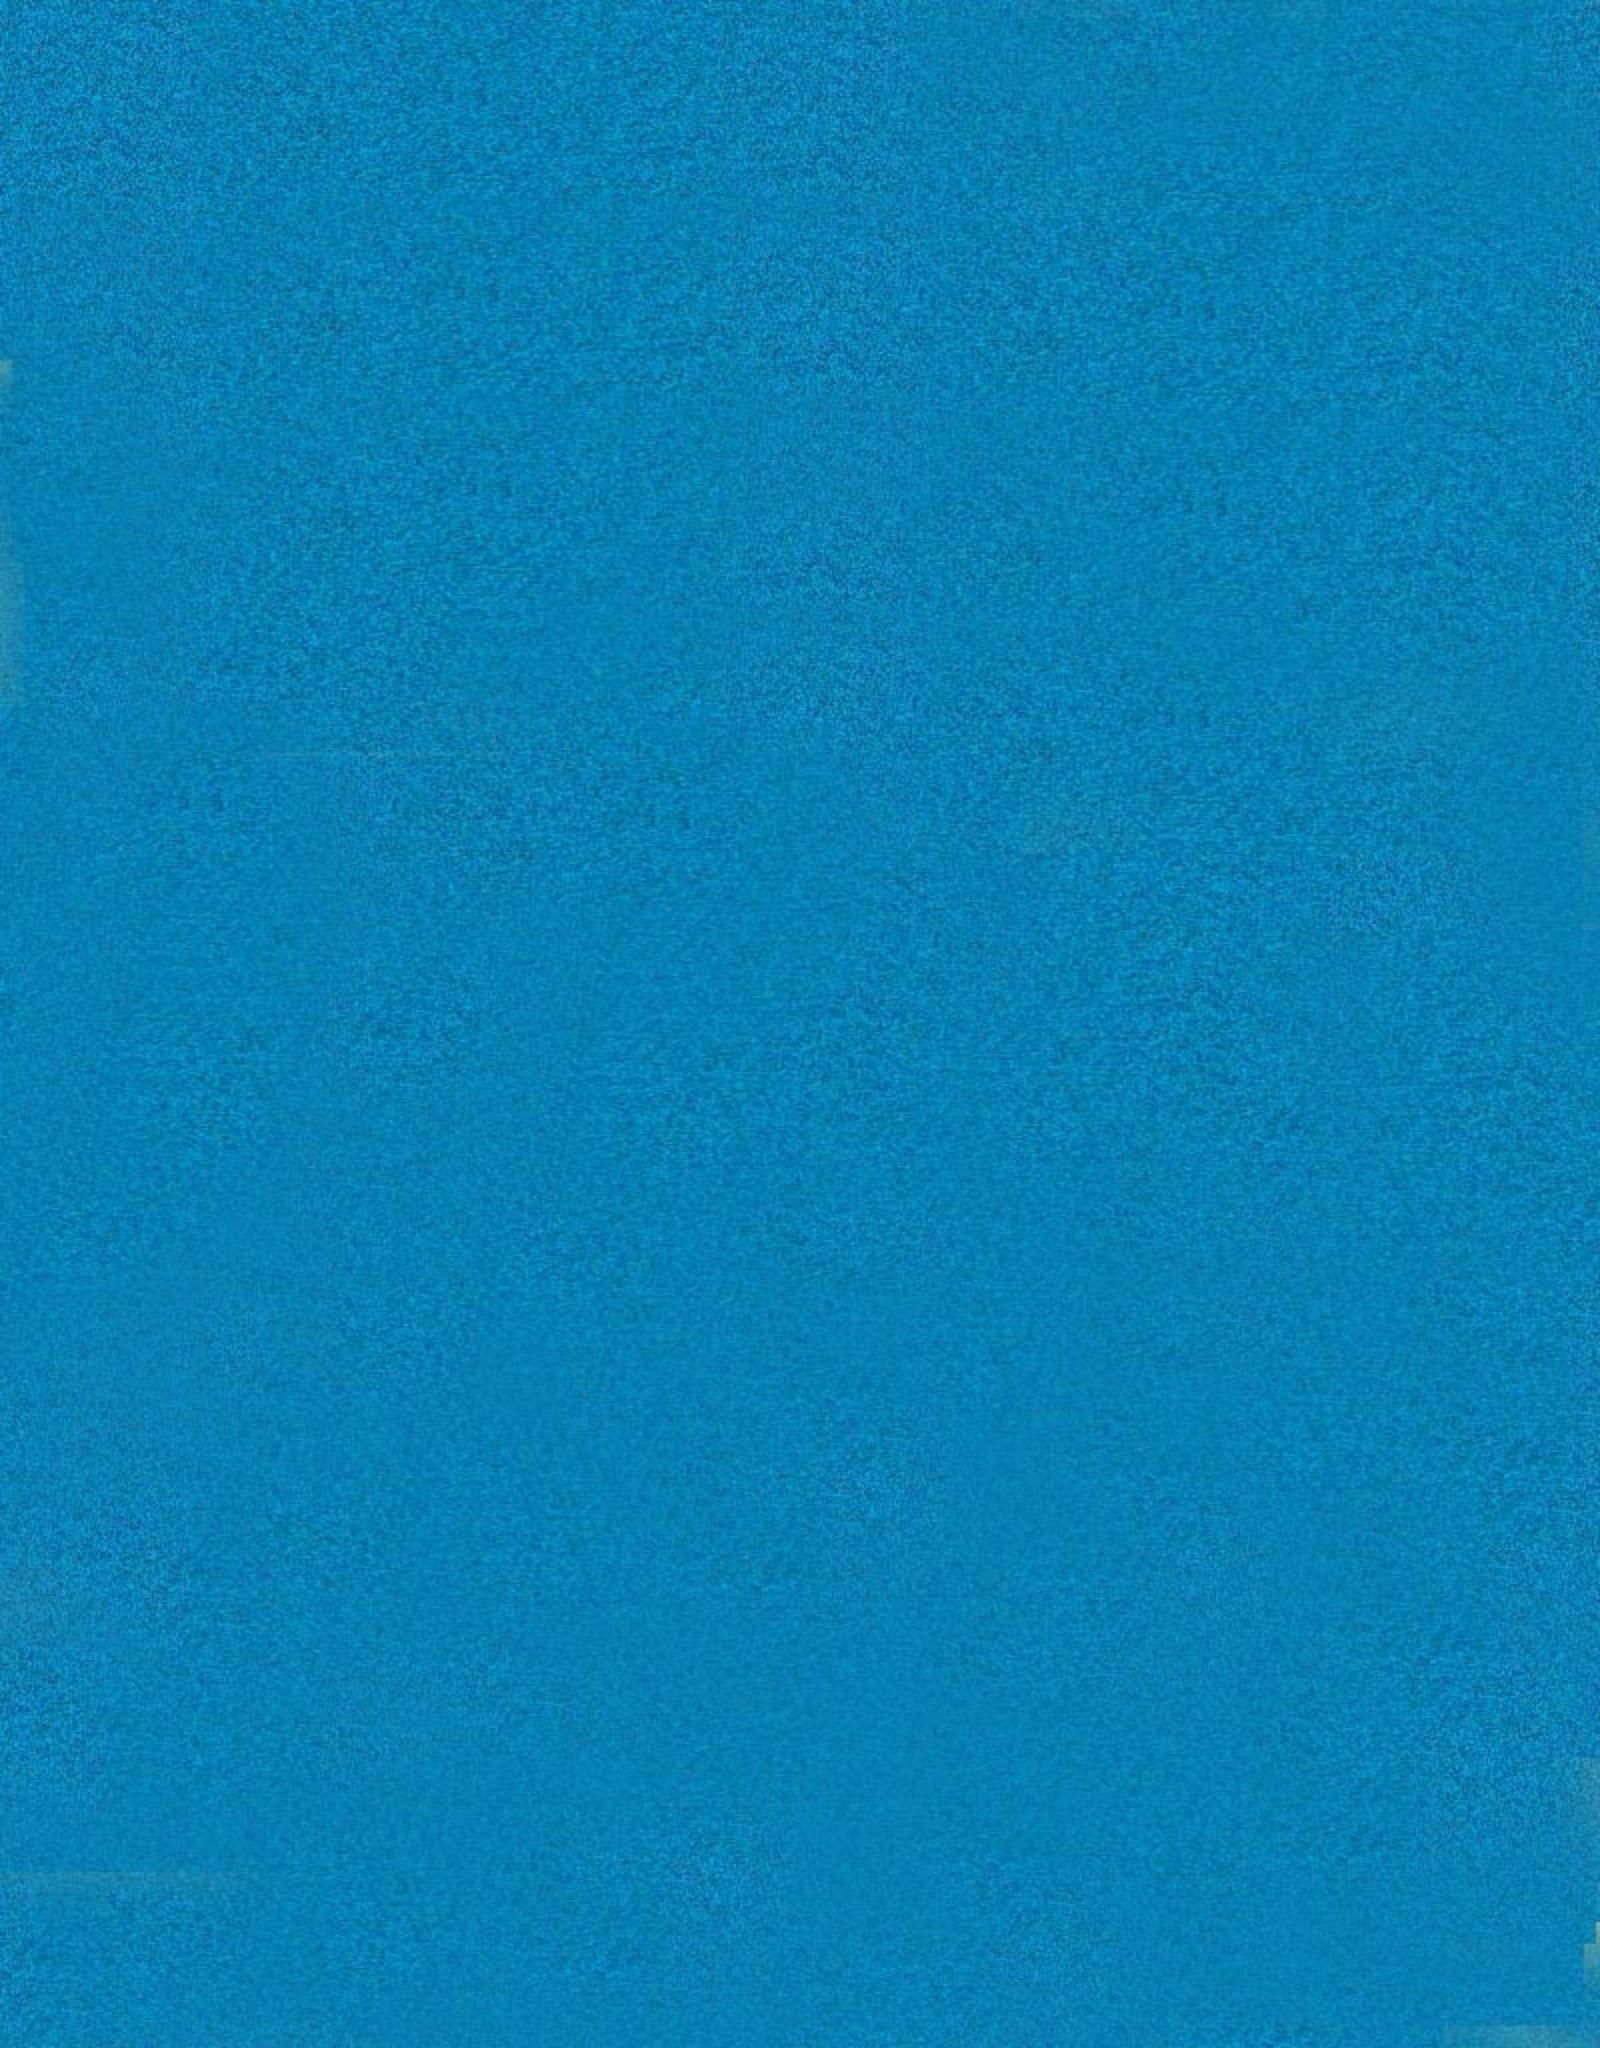 Jacquard Jacquard Lumiere Pearlescent Blue